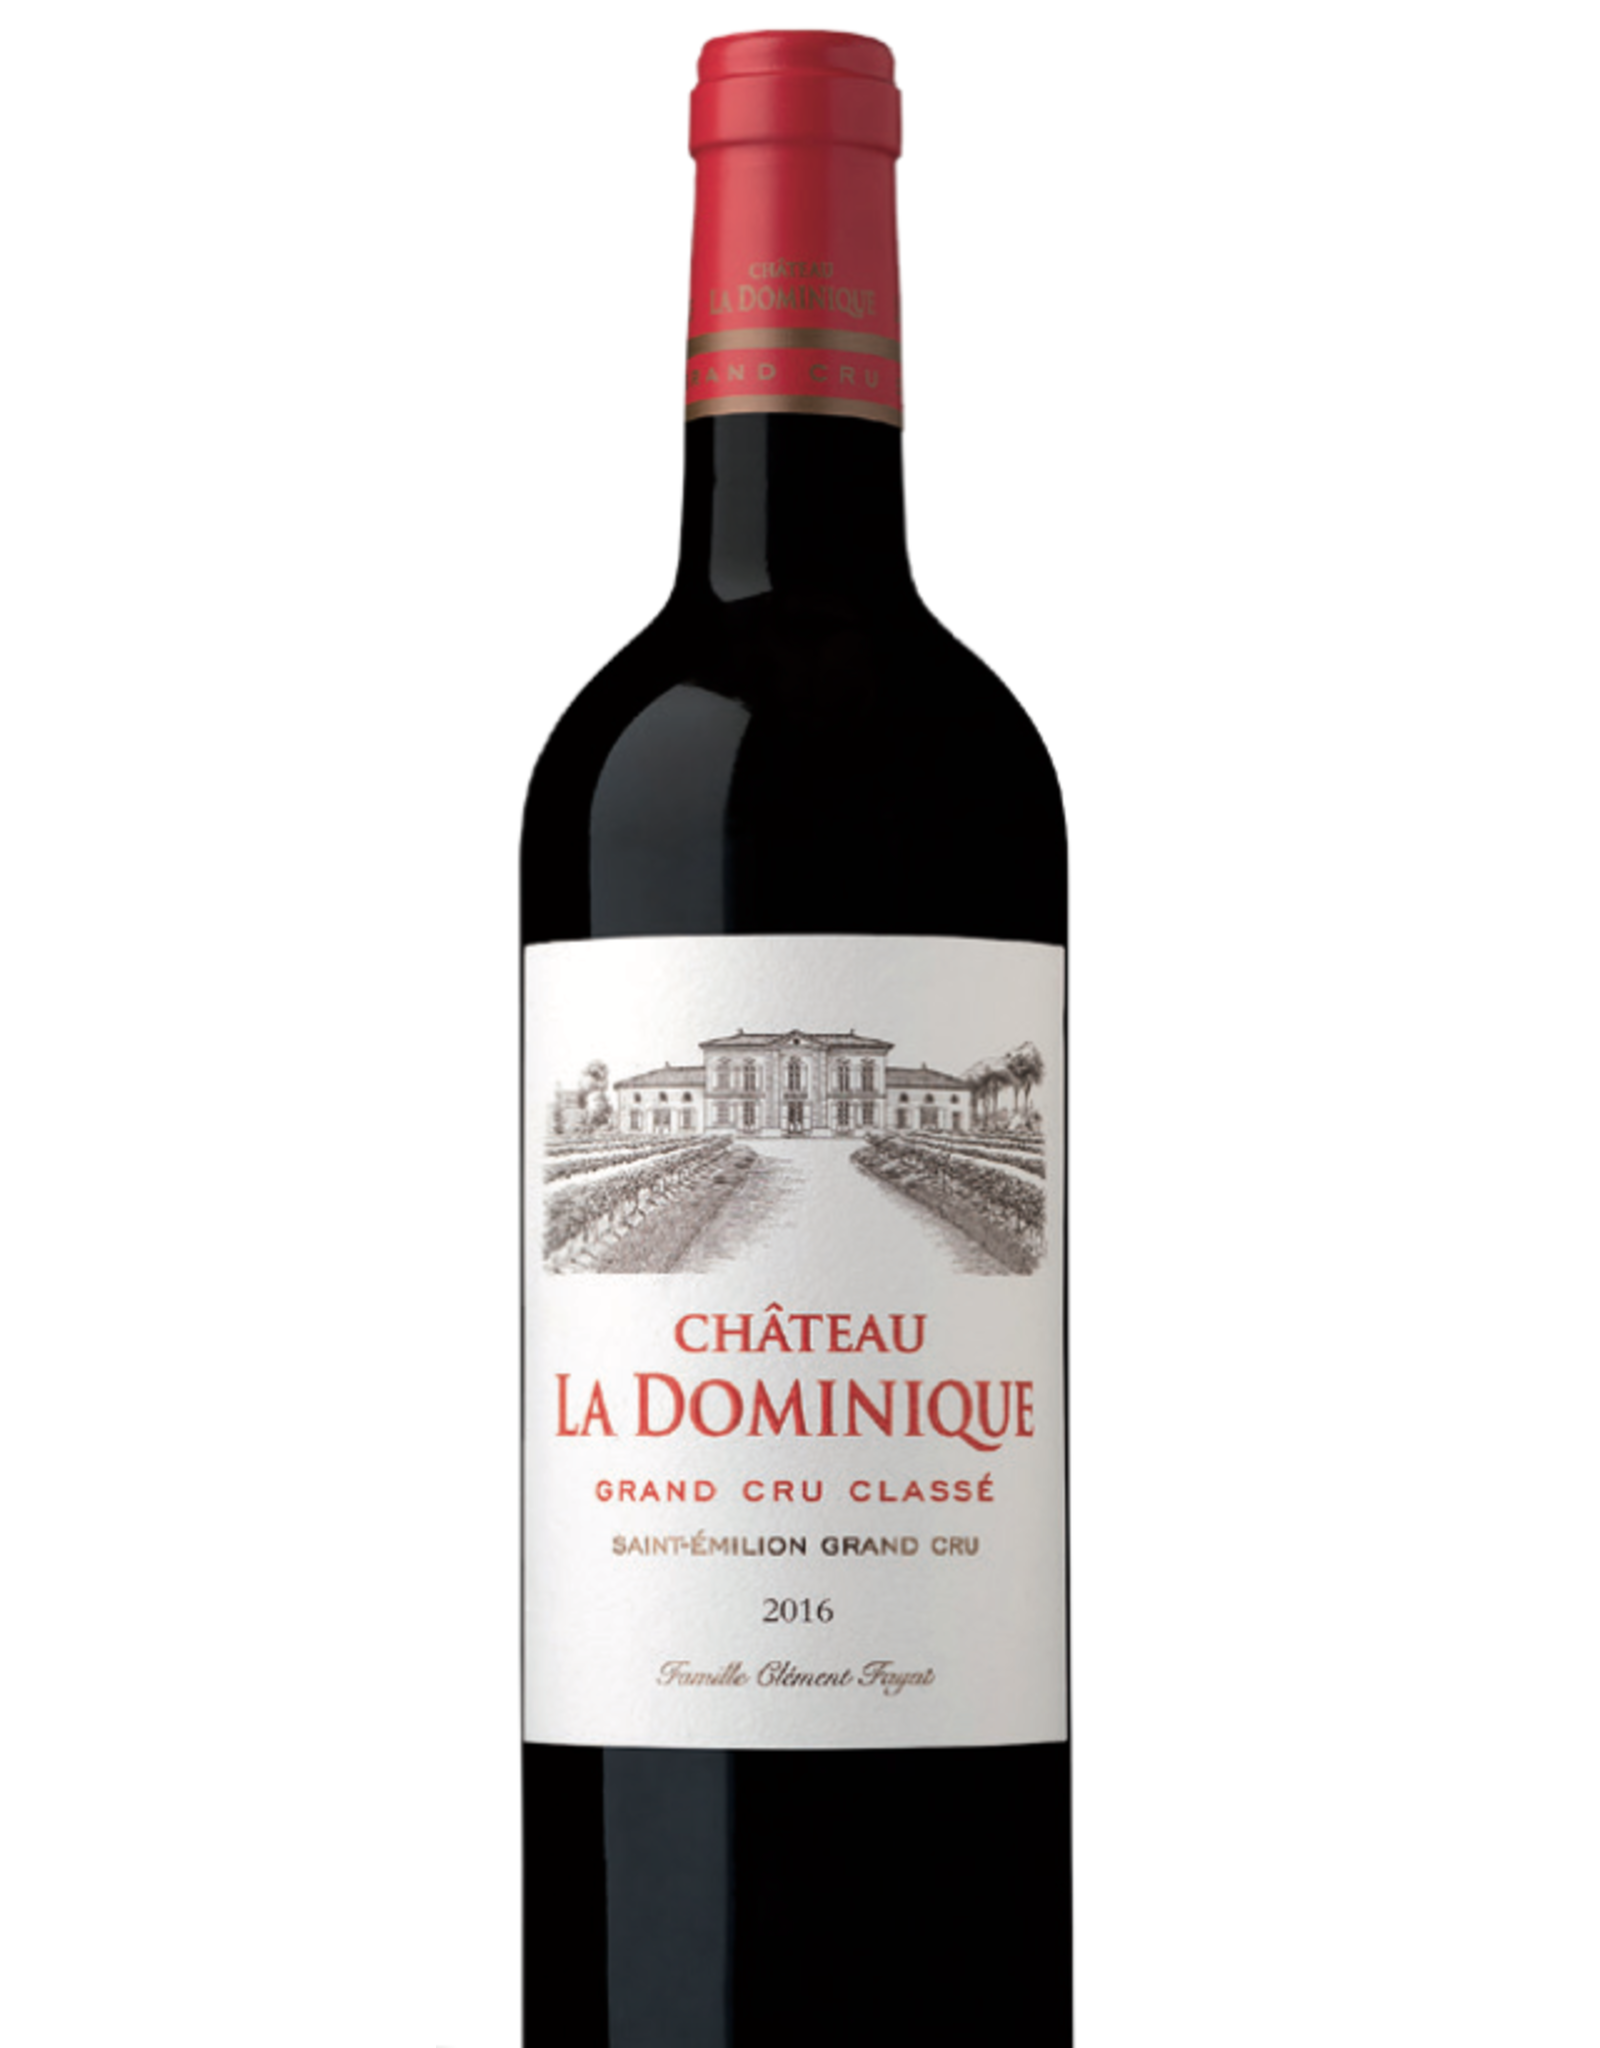 Château La Dominique Château La Dominique 2016 - St.Emilion